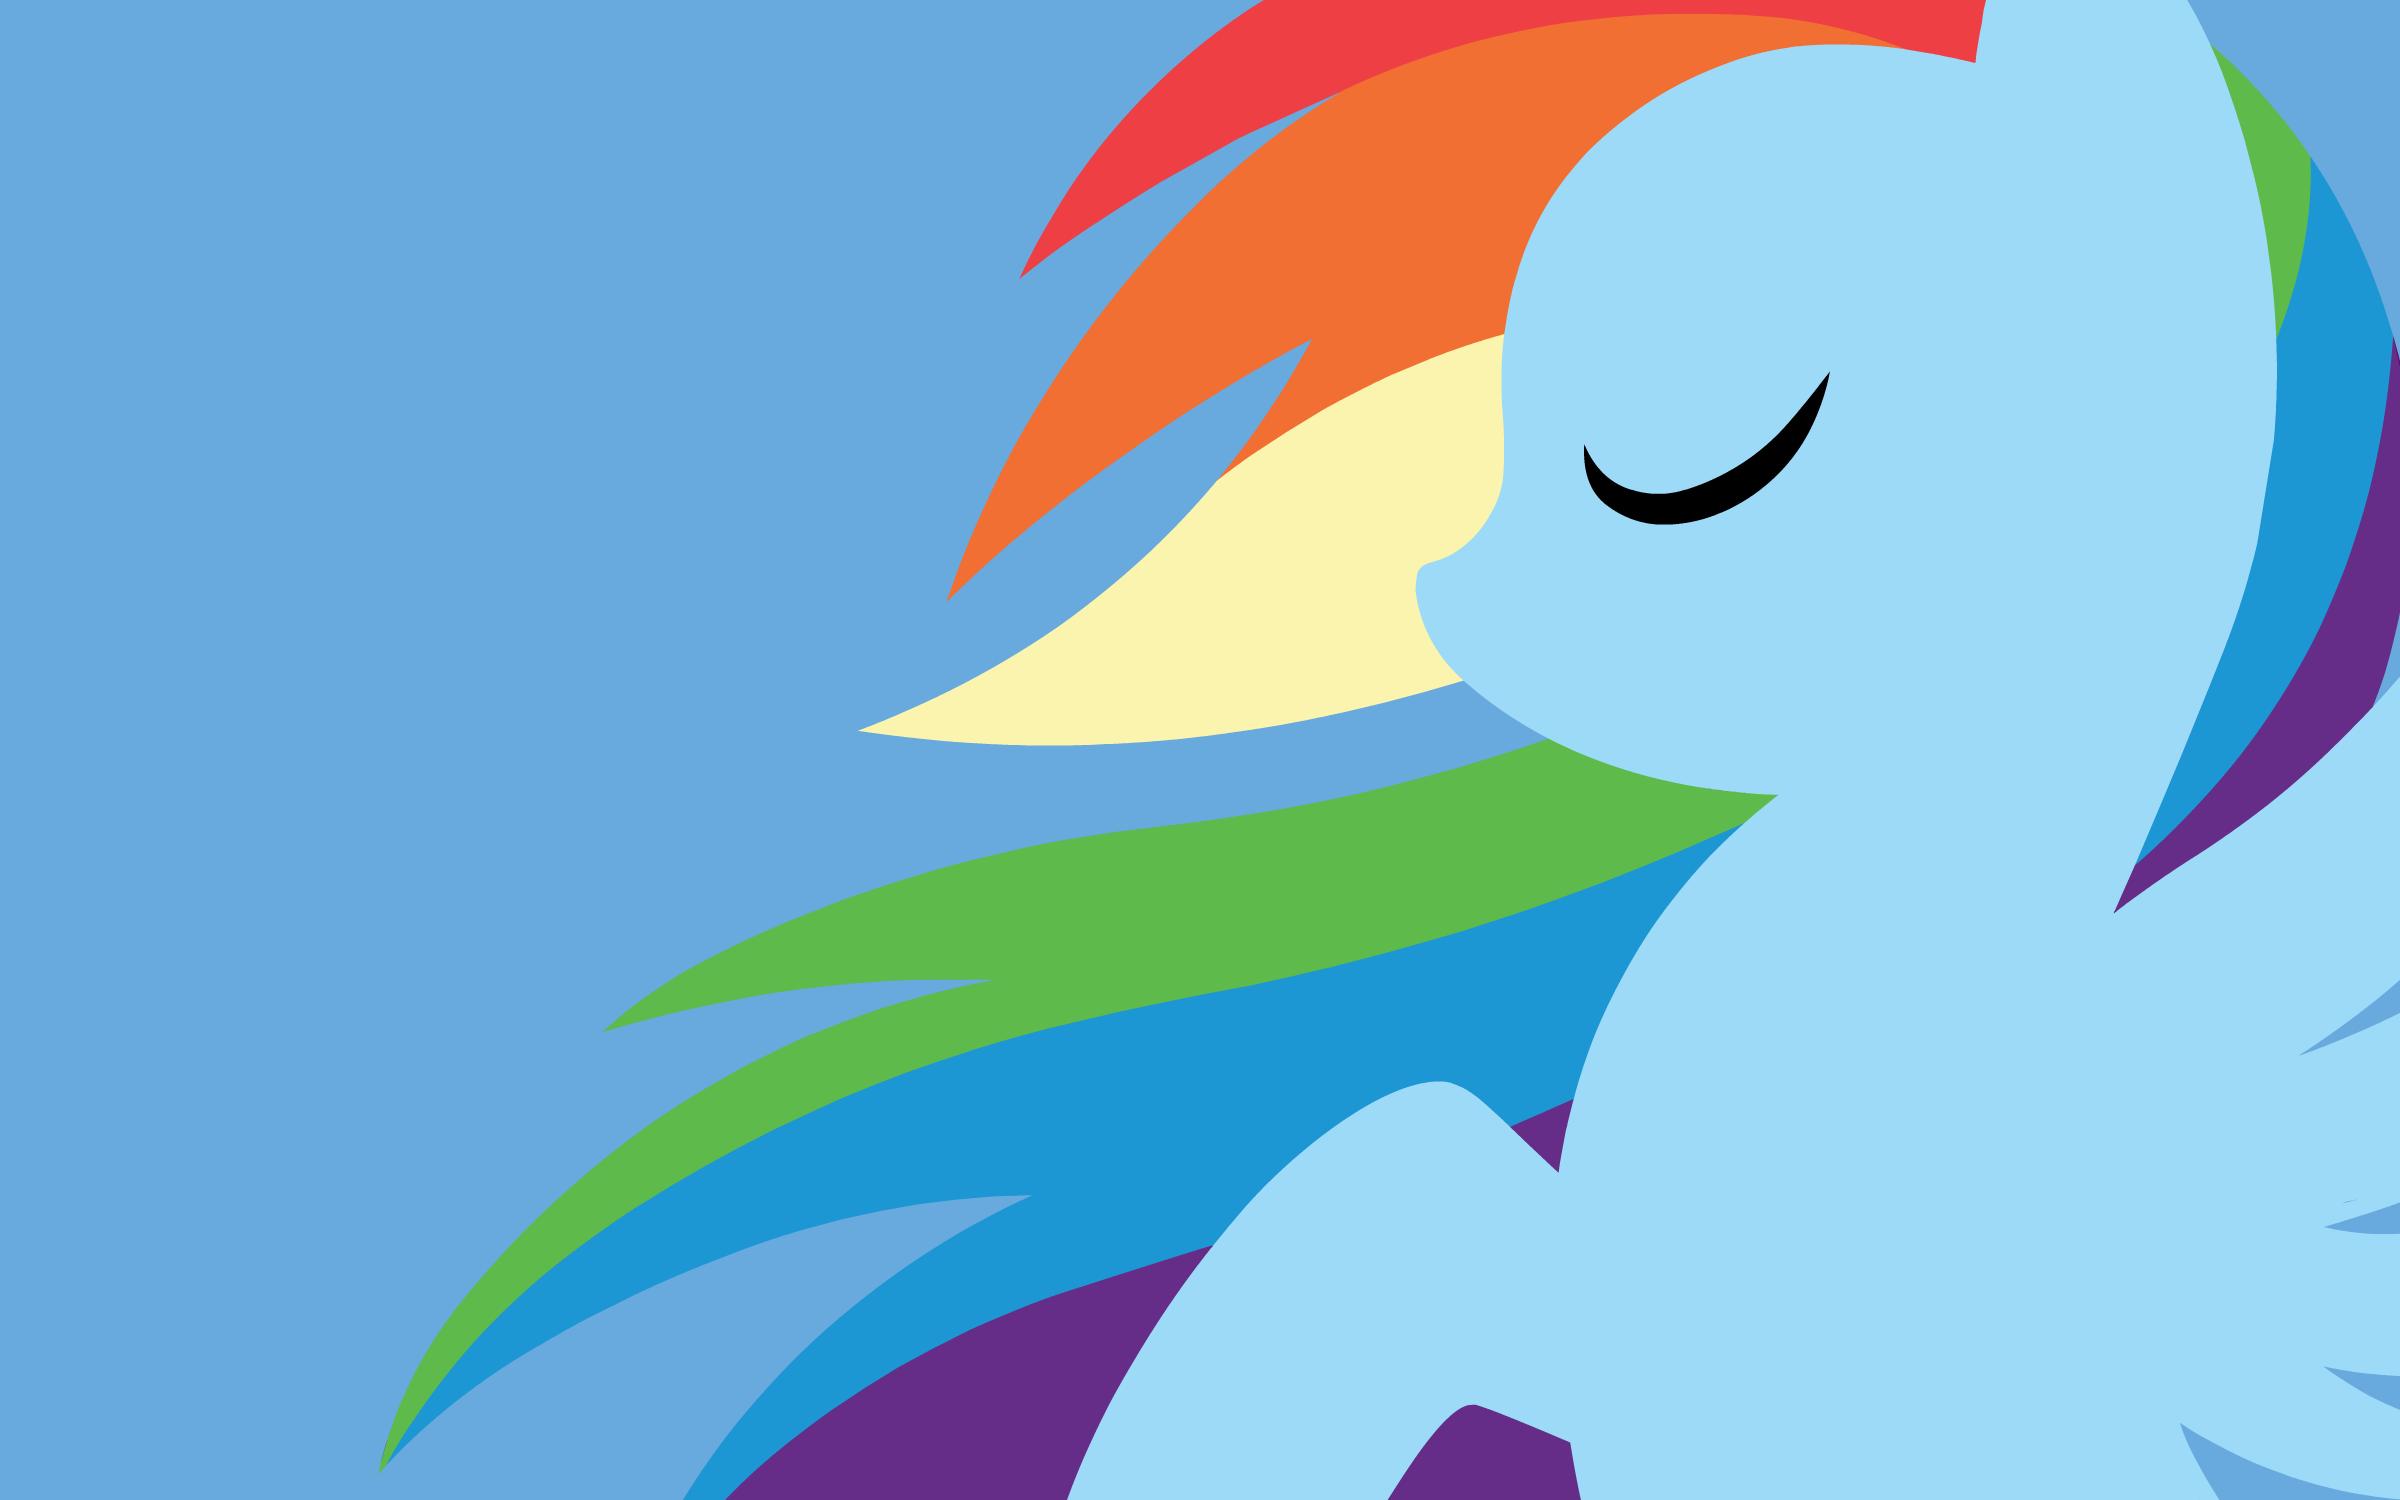 Download Mlp Wallpaper Rainbow Dash 428196 Hd Wallpaper